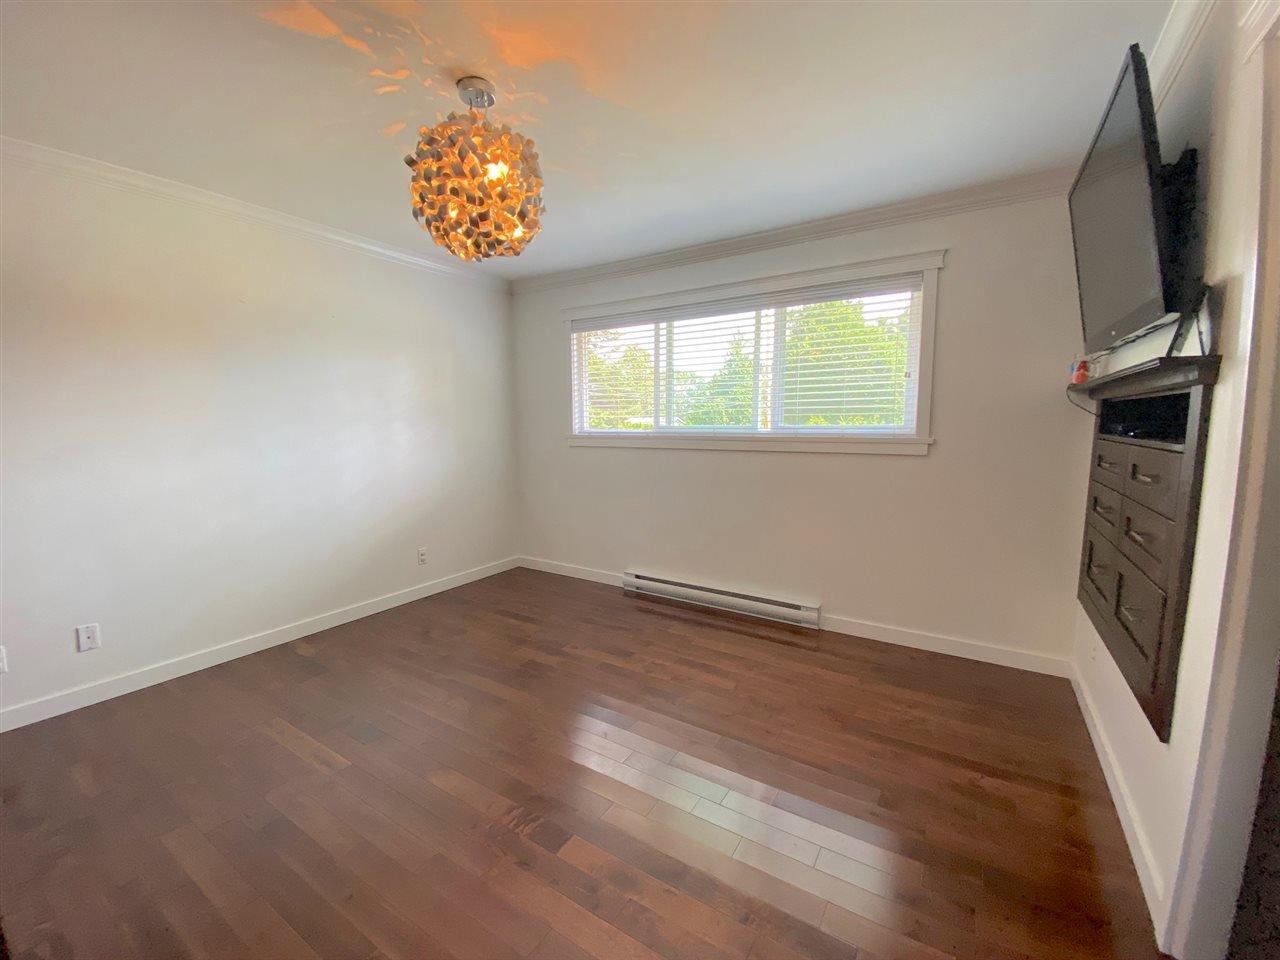 Photo 6: Photos: 555 55A STREET in Delta: Pebble Hill House for sale (Tsawwassen)  : MLS®# R2481635